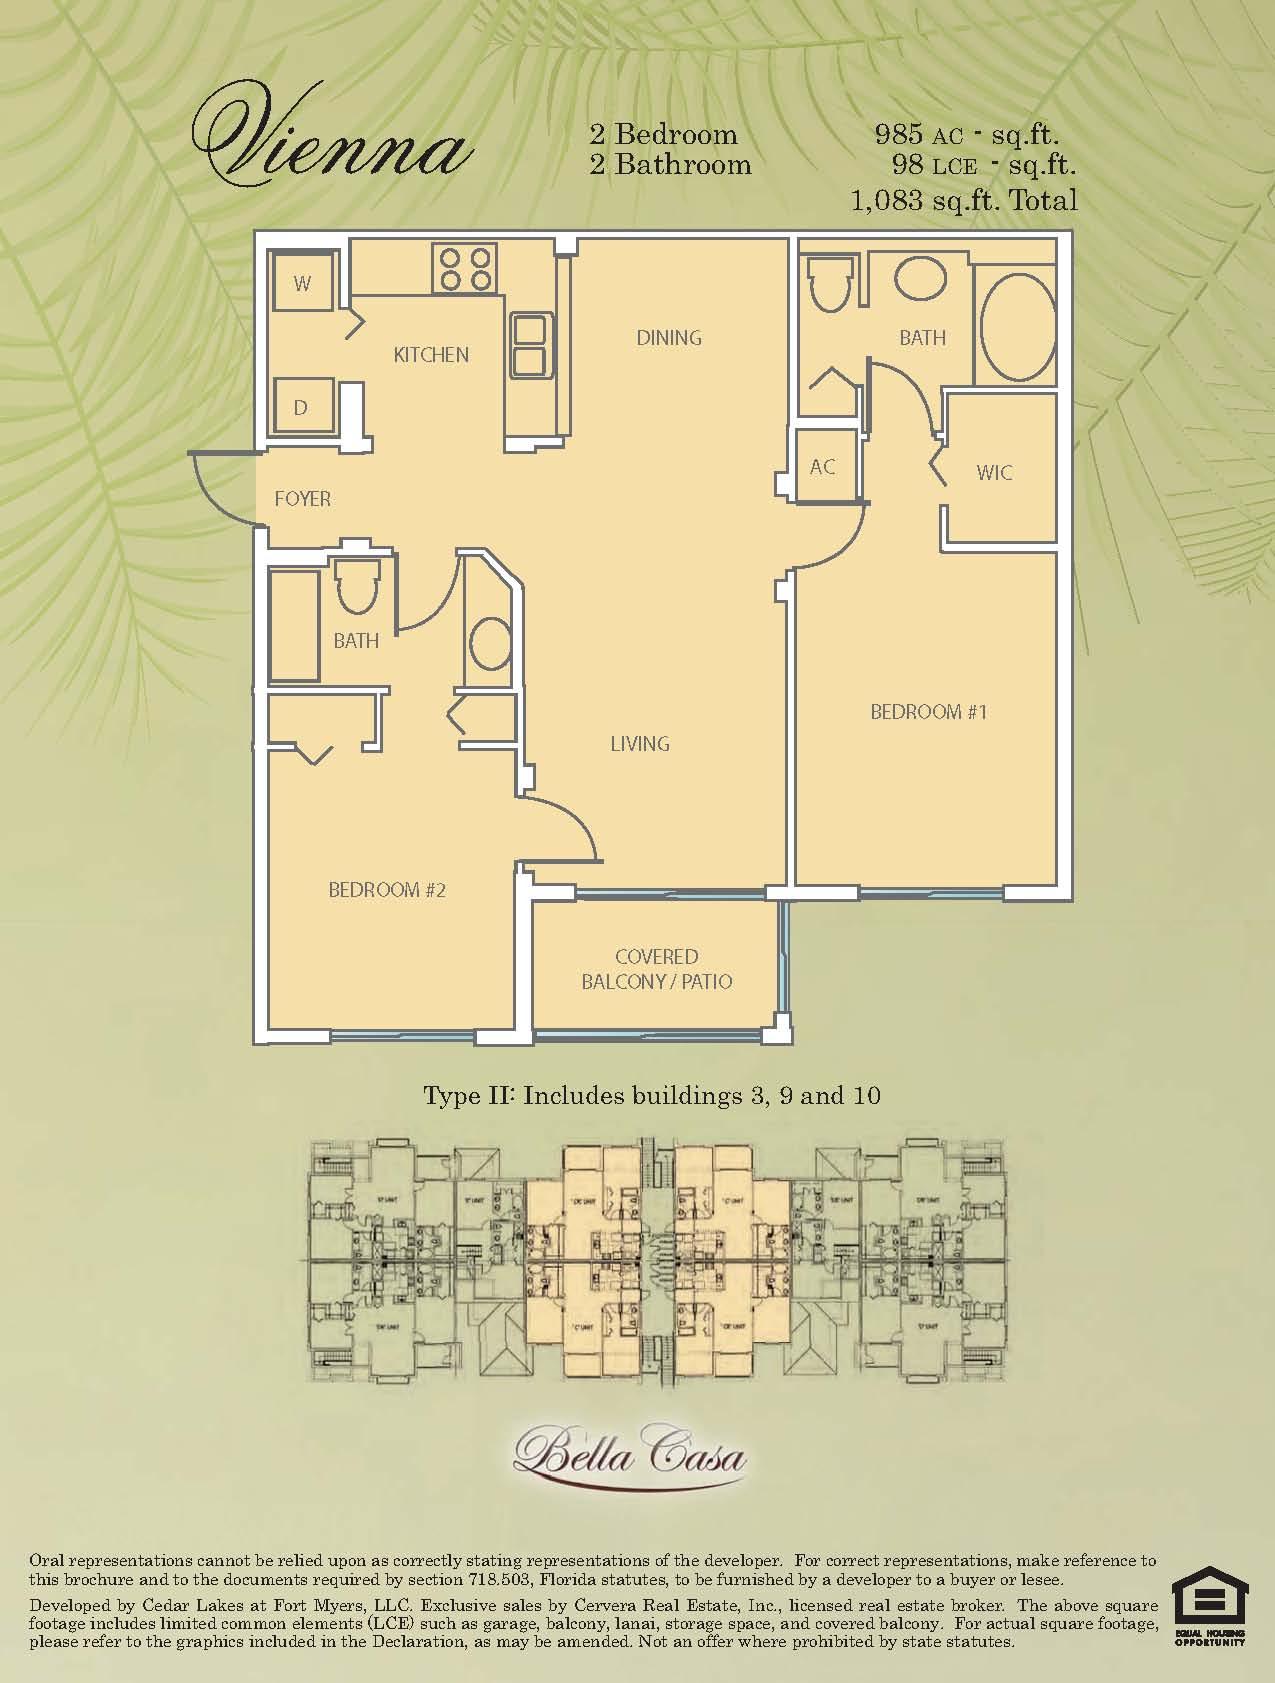 bella casa ft myers condos sale rent floor plans vienna 2 2 985 download pdf